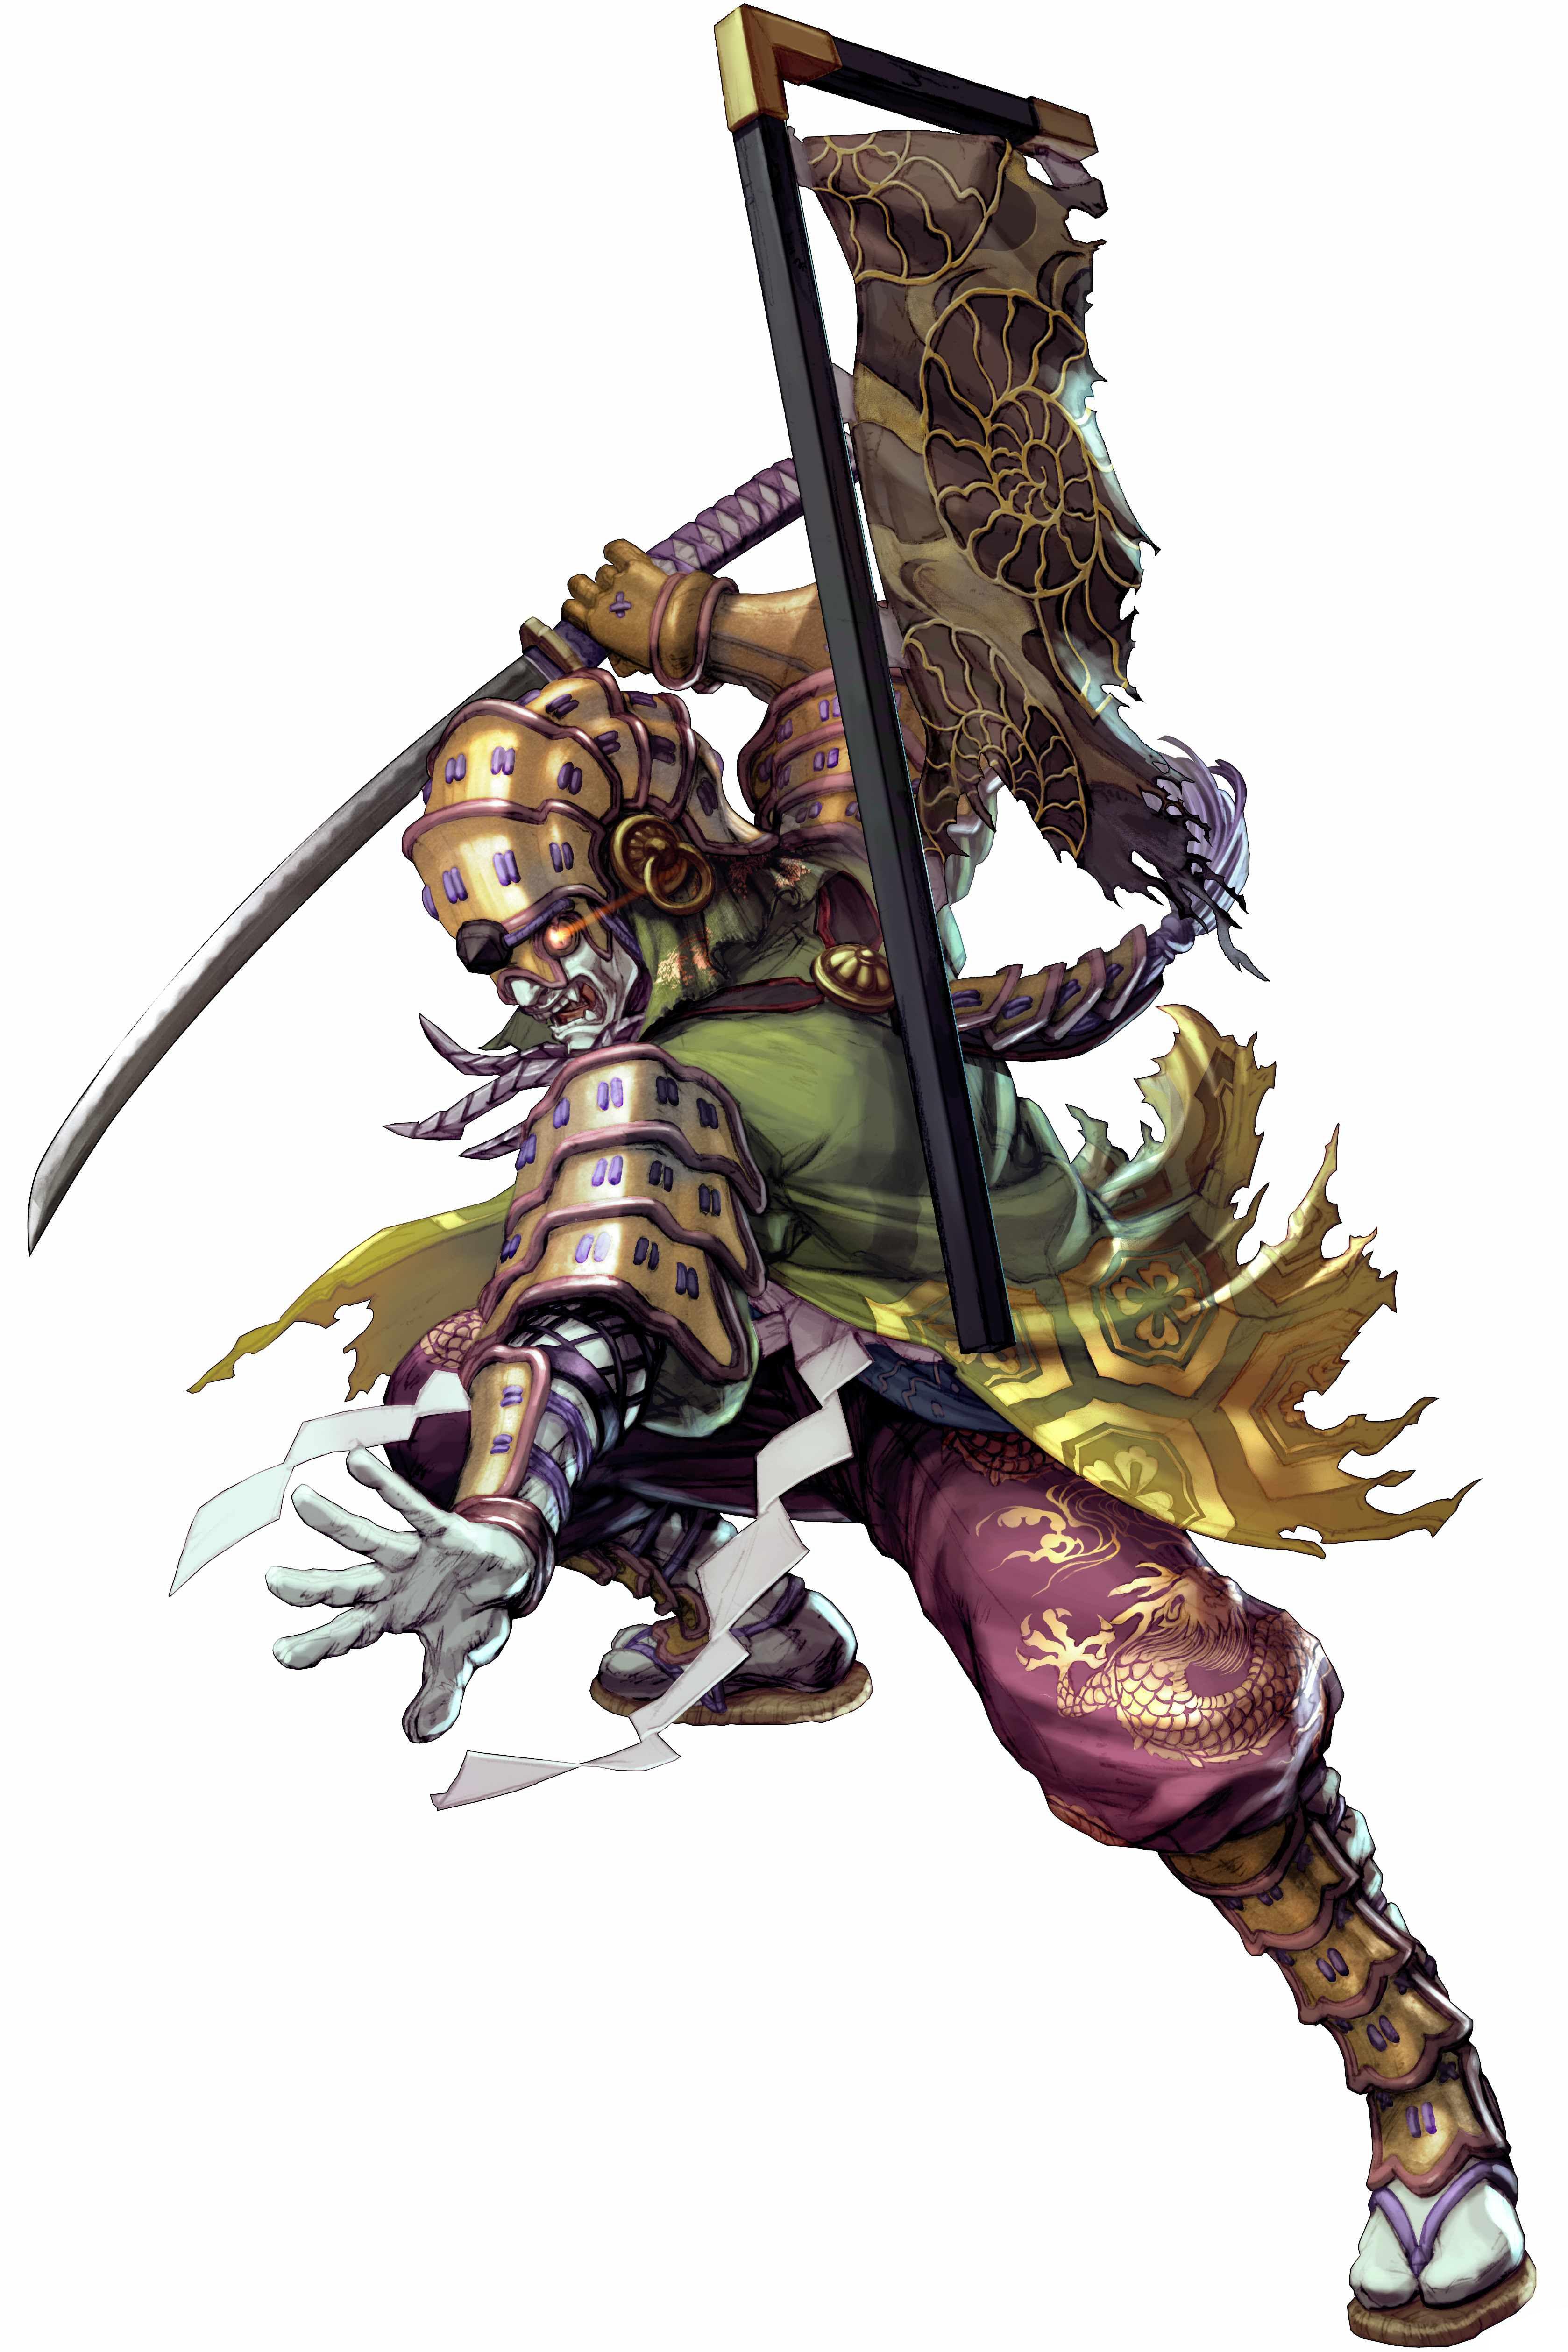 Yoshimitsu Character Design : Yoshimitsu in soul calibur g